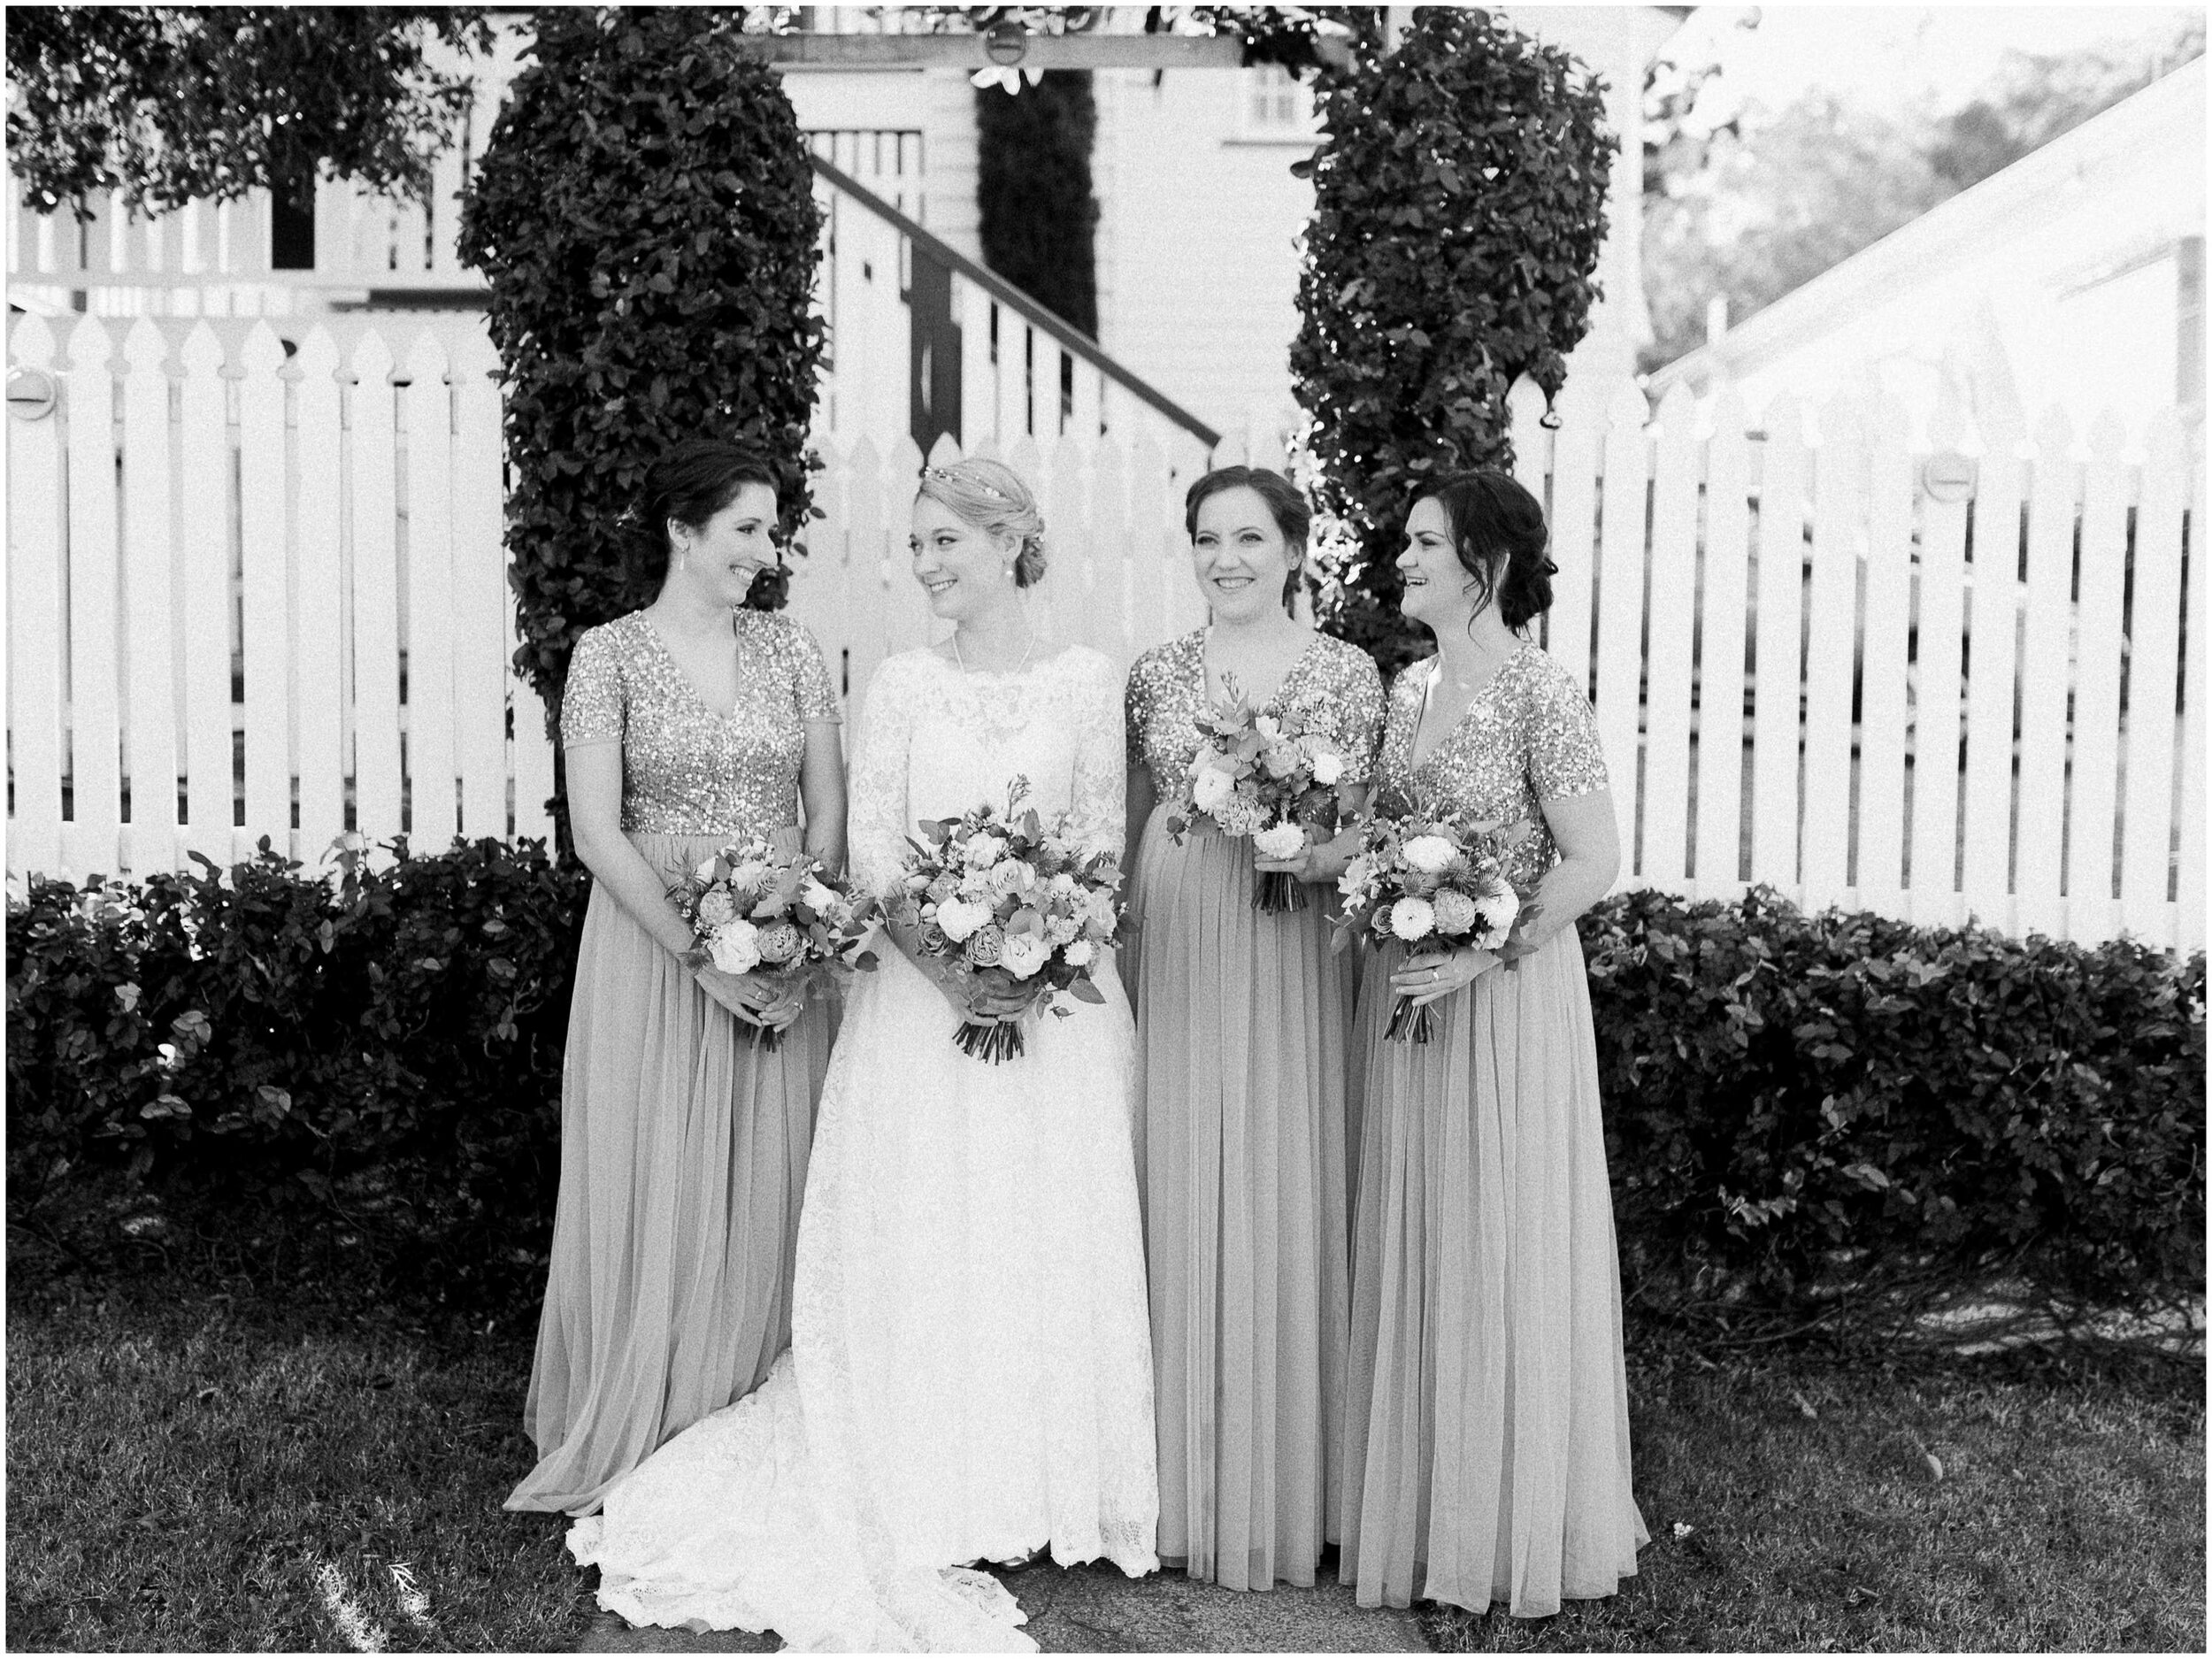 brisbane-film-wedding-photographer-lauren-olivia-luxury-wedding-australia-01-01.jpg